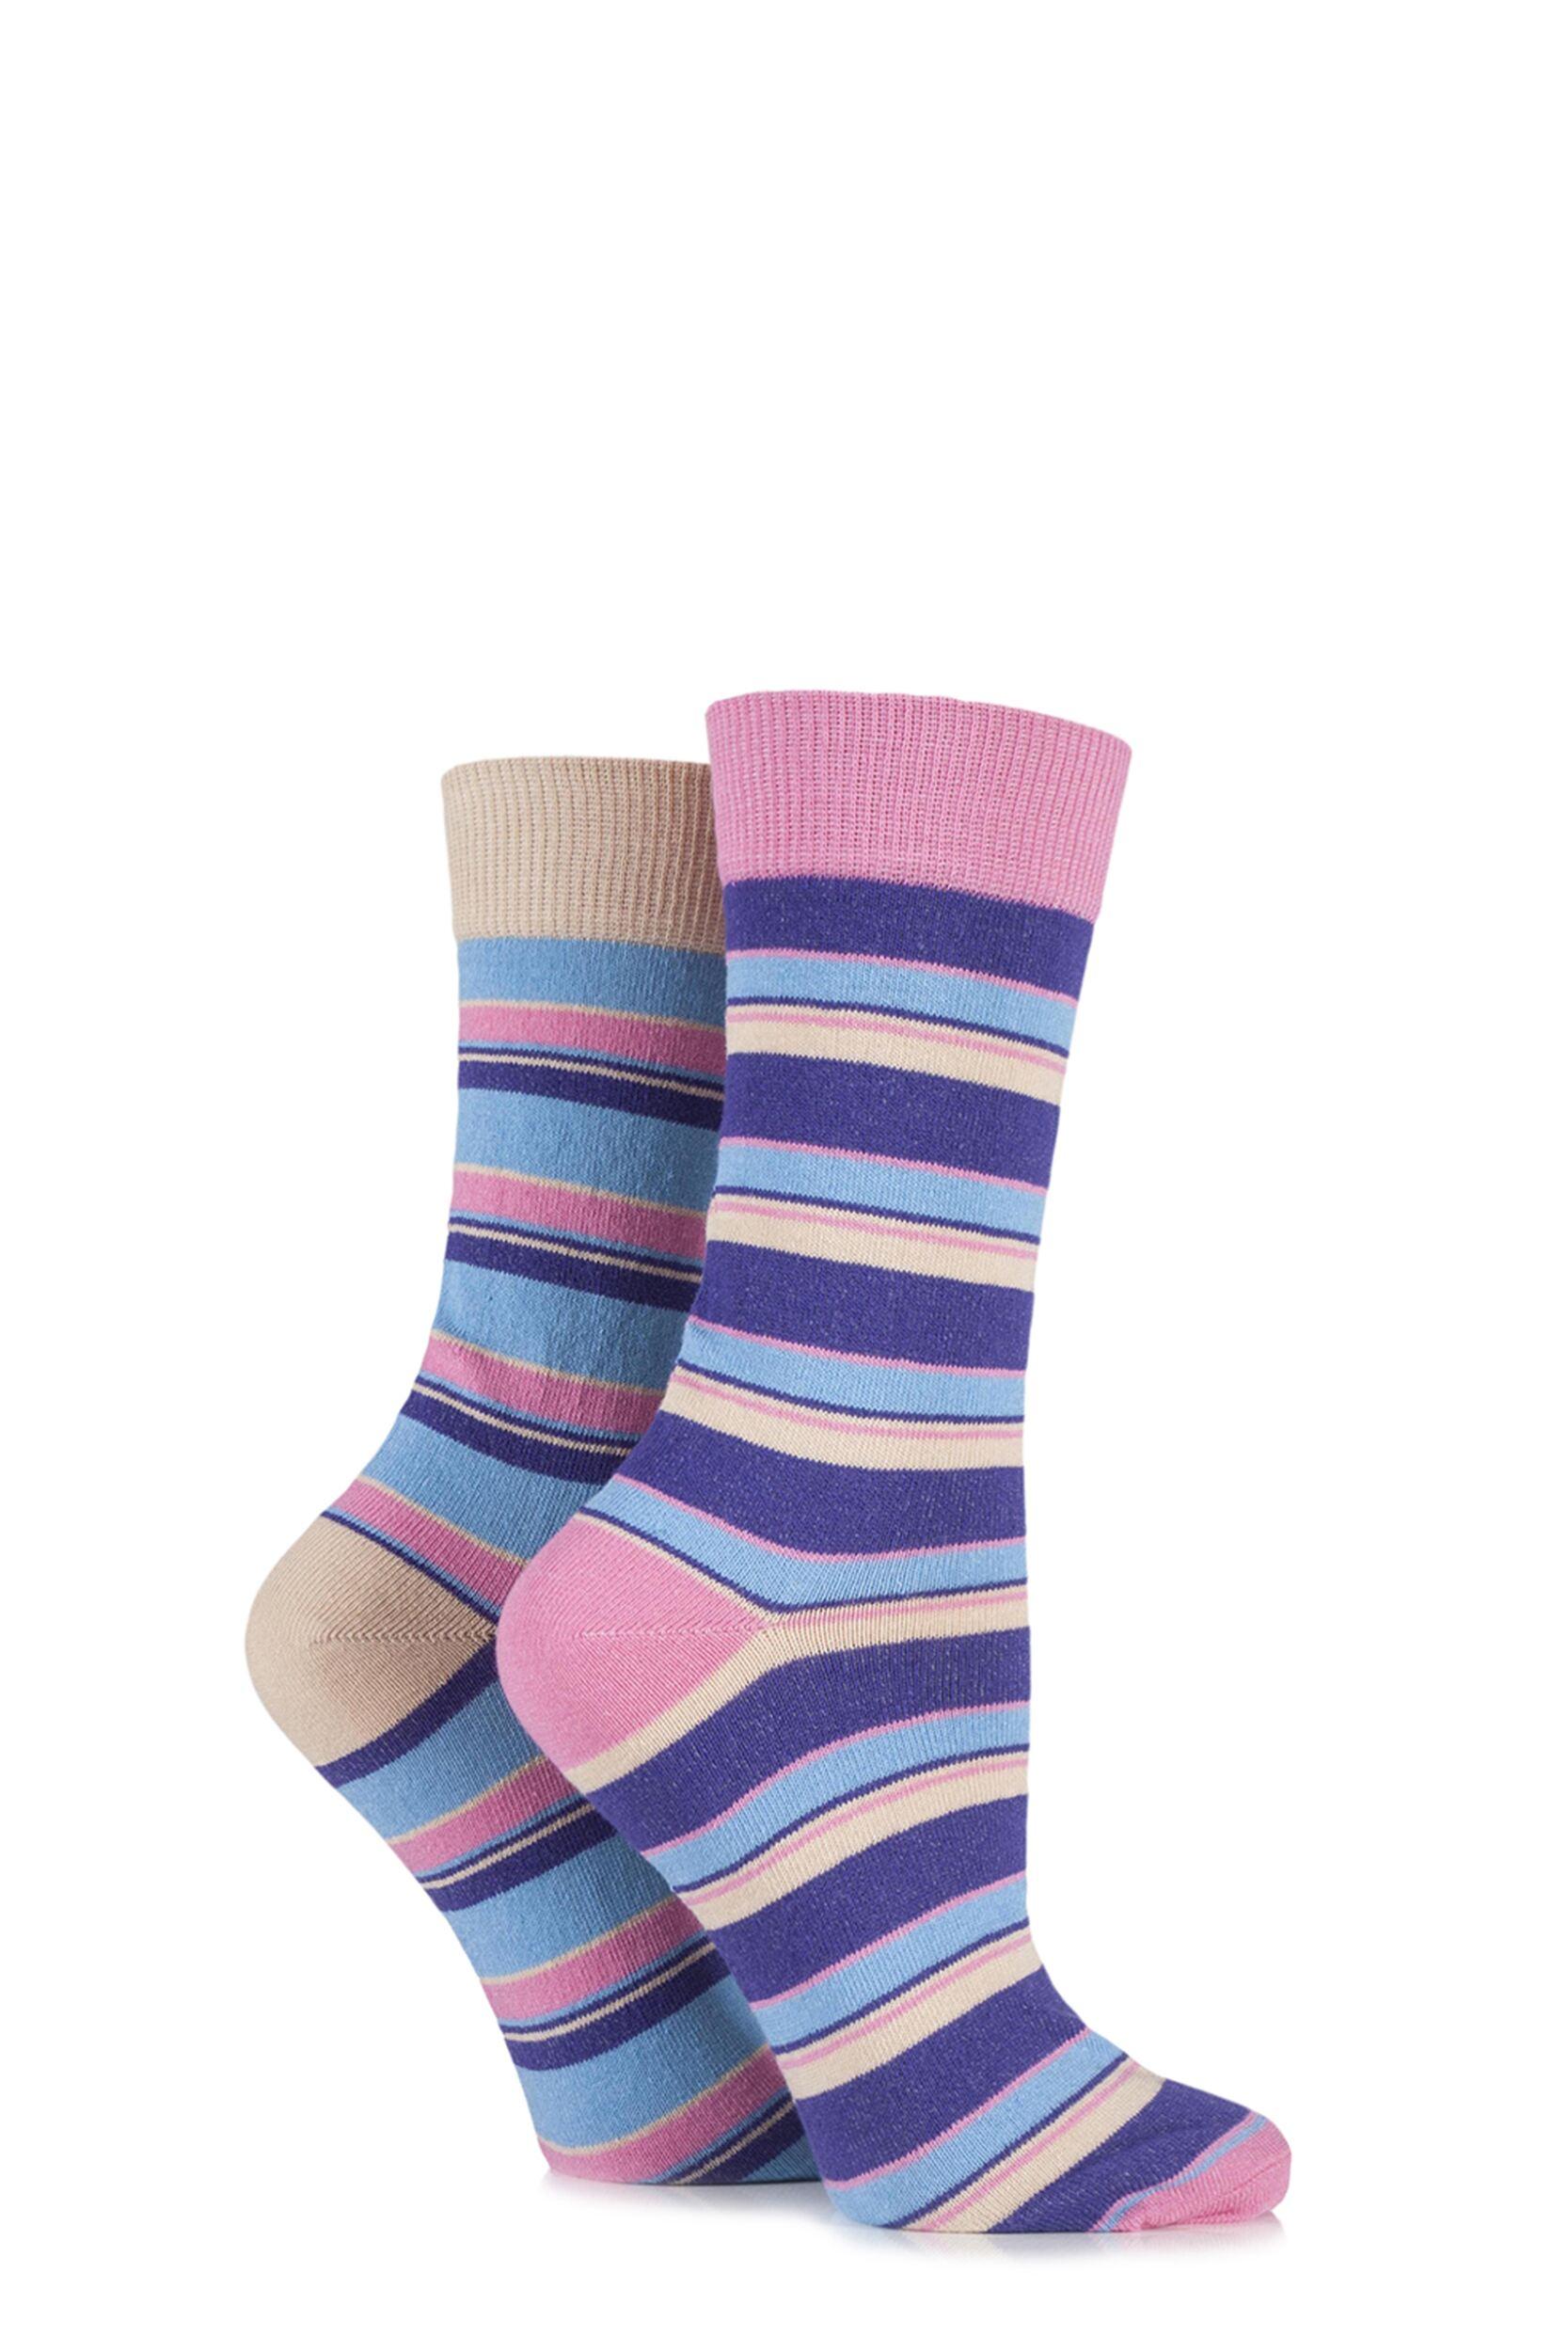 Ladies 2 Pair HJ Hall Boscastle Striped Cotton Socks